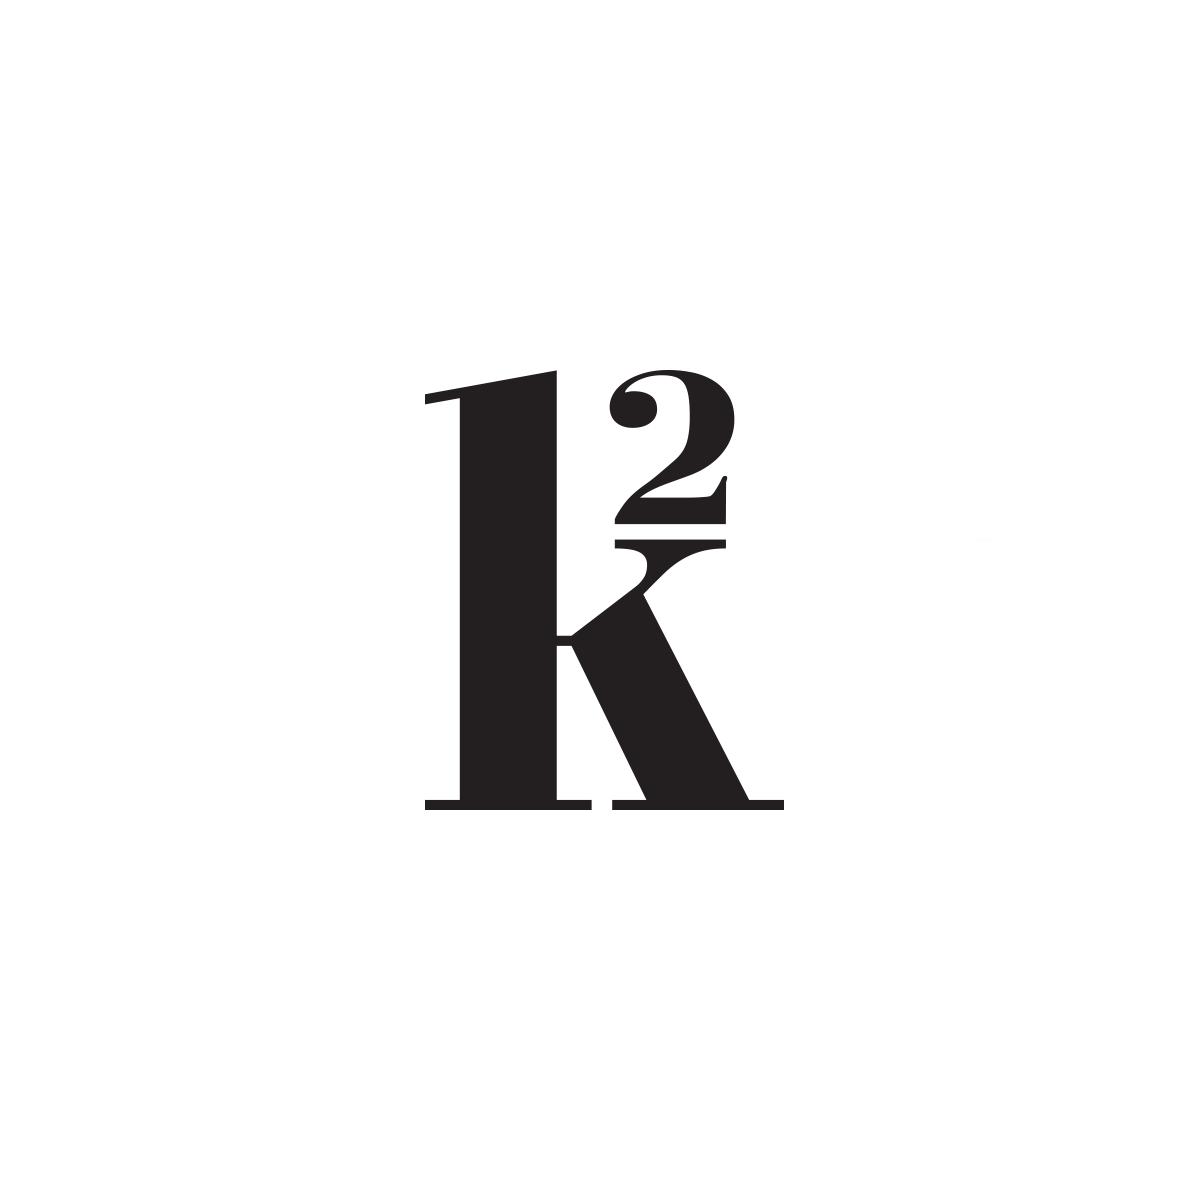 kreativkopf (k2) #creative #graphic #design #agency #logo.